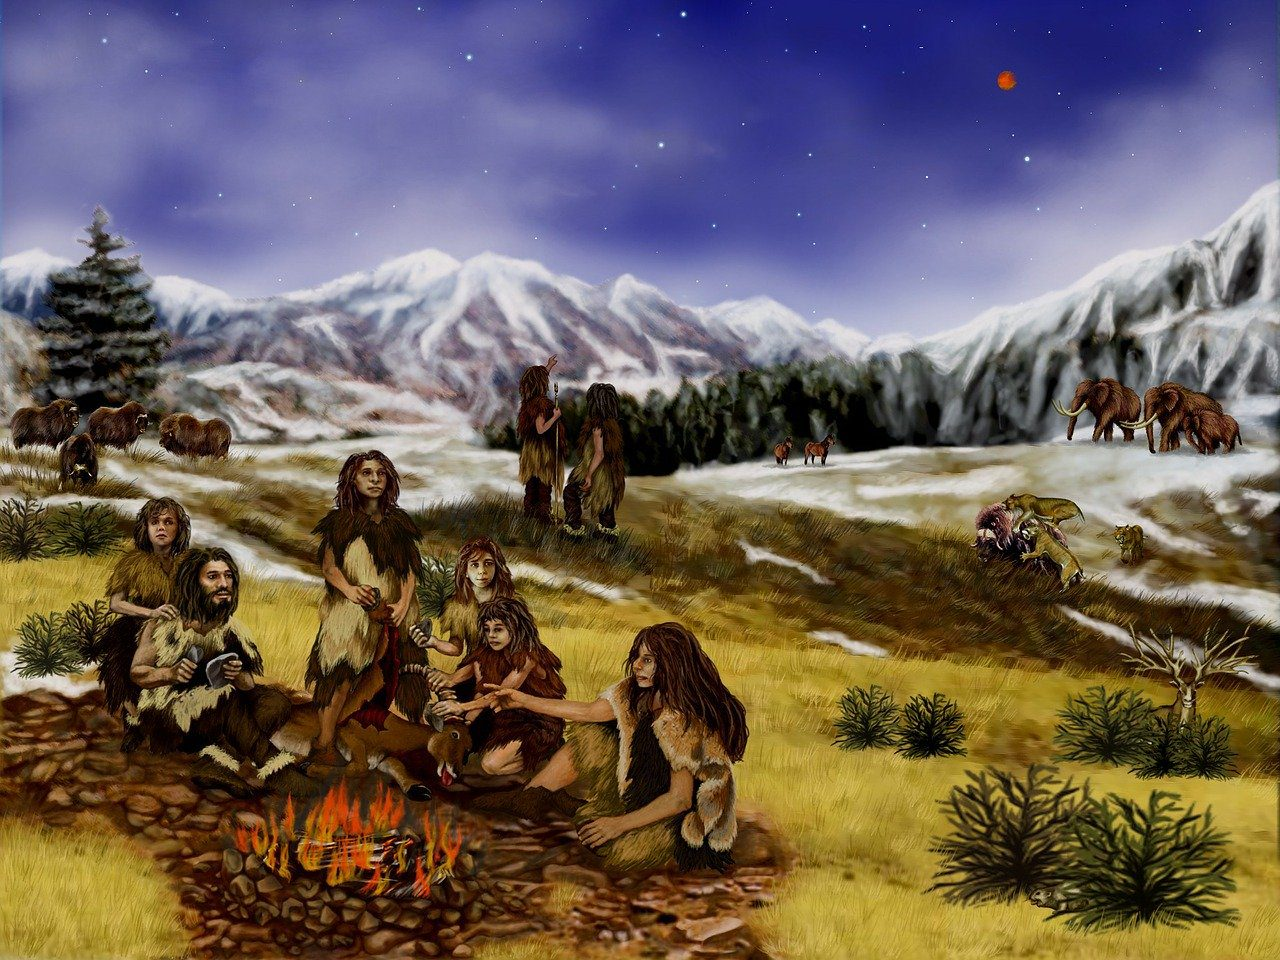 Neandertal insan